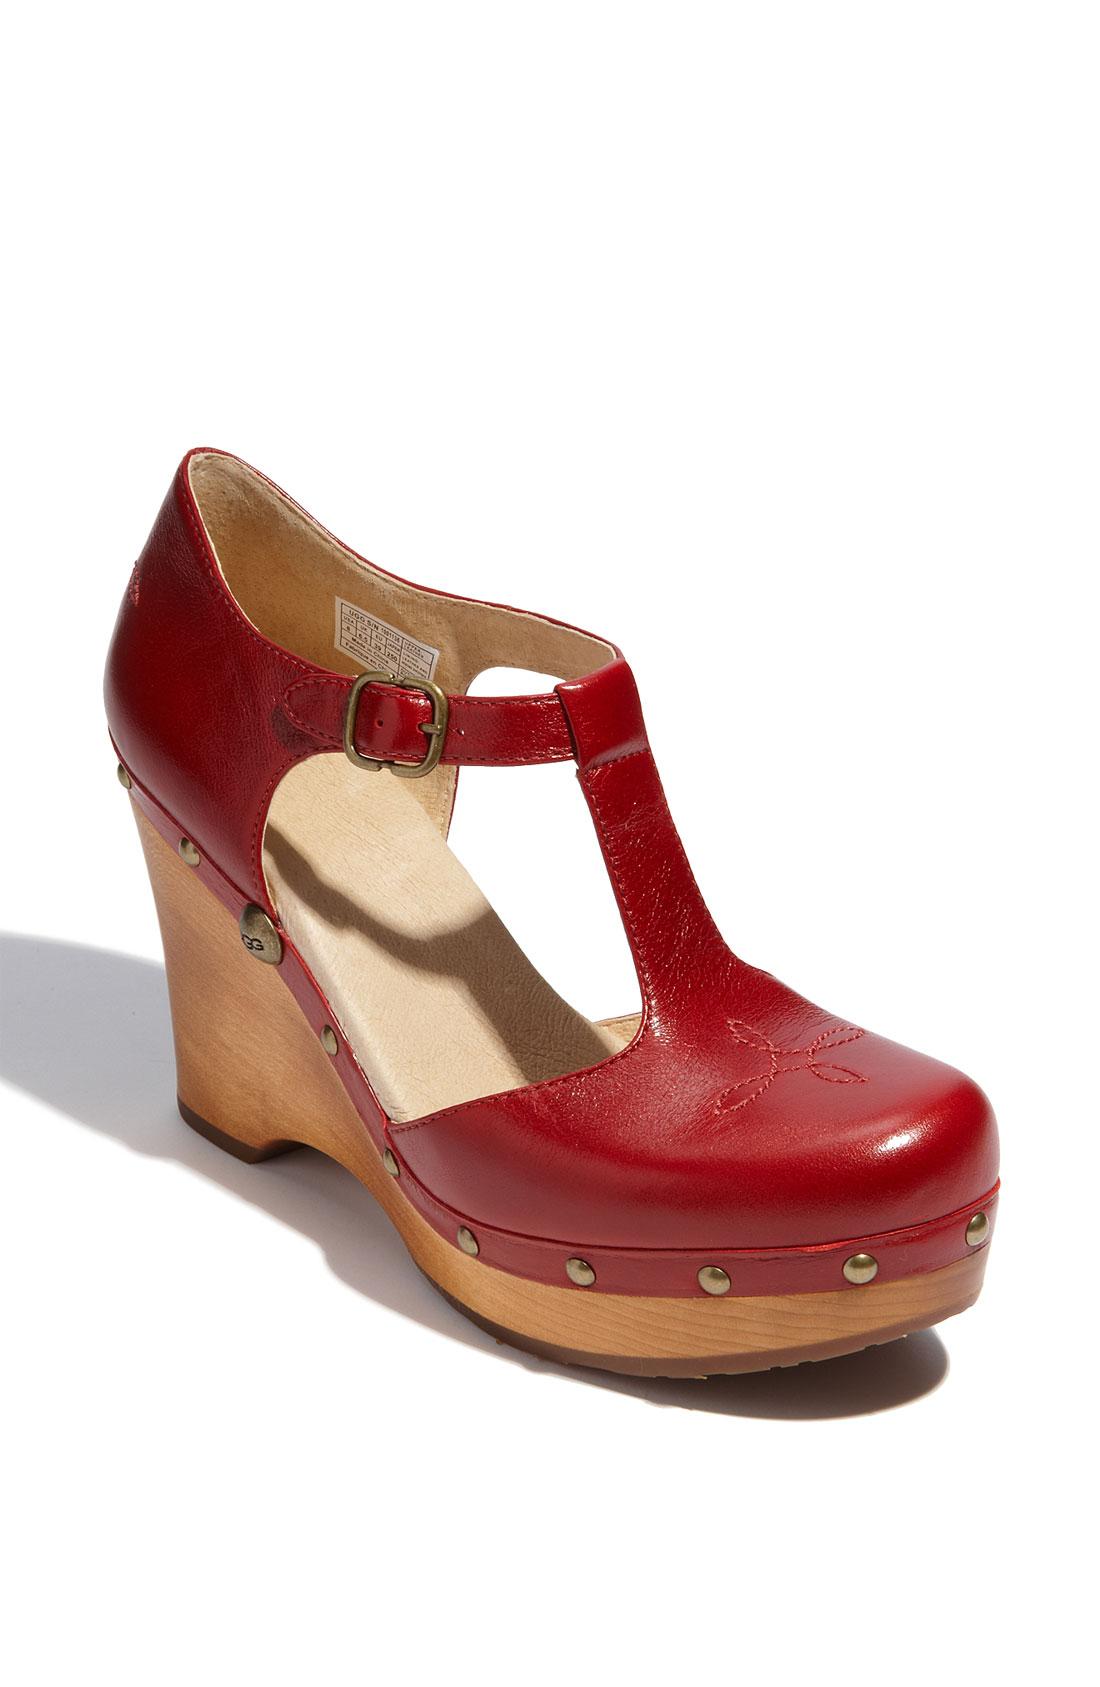 Chrissie Collection Shoes Australia